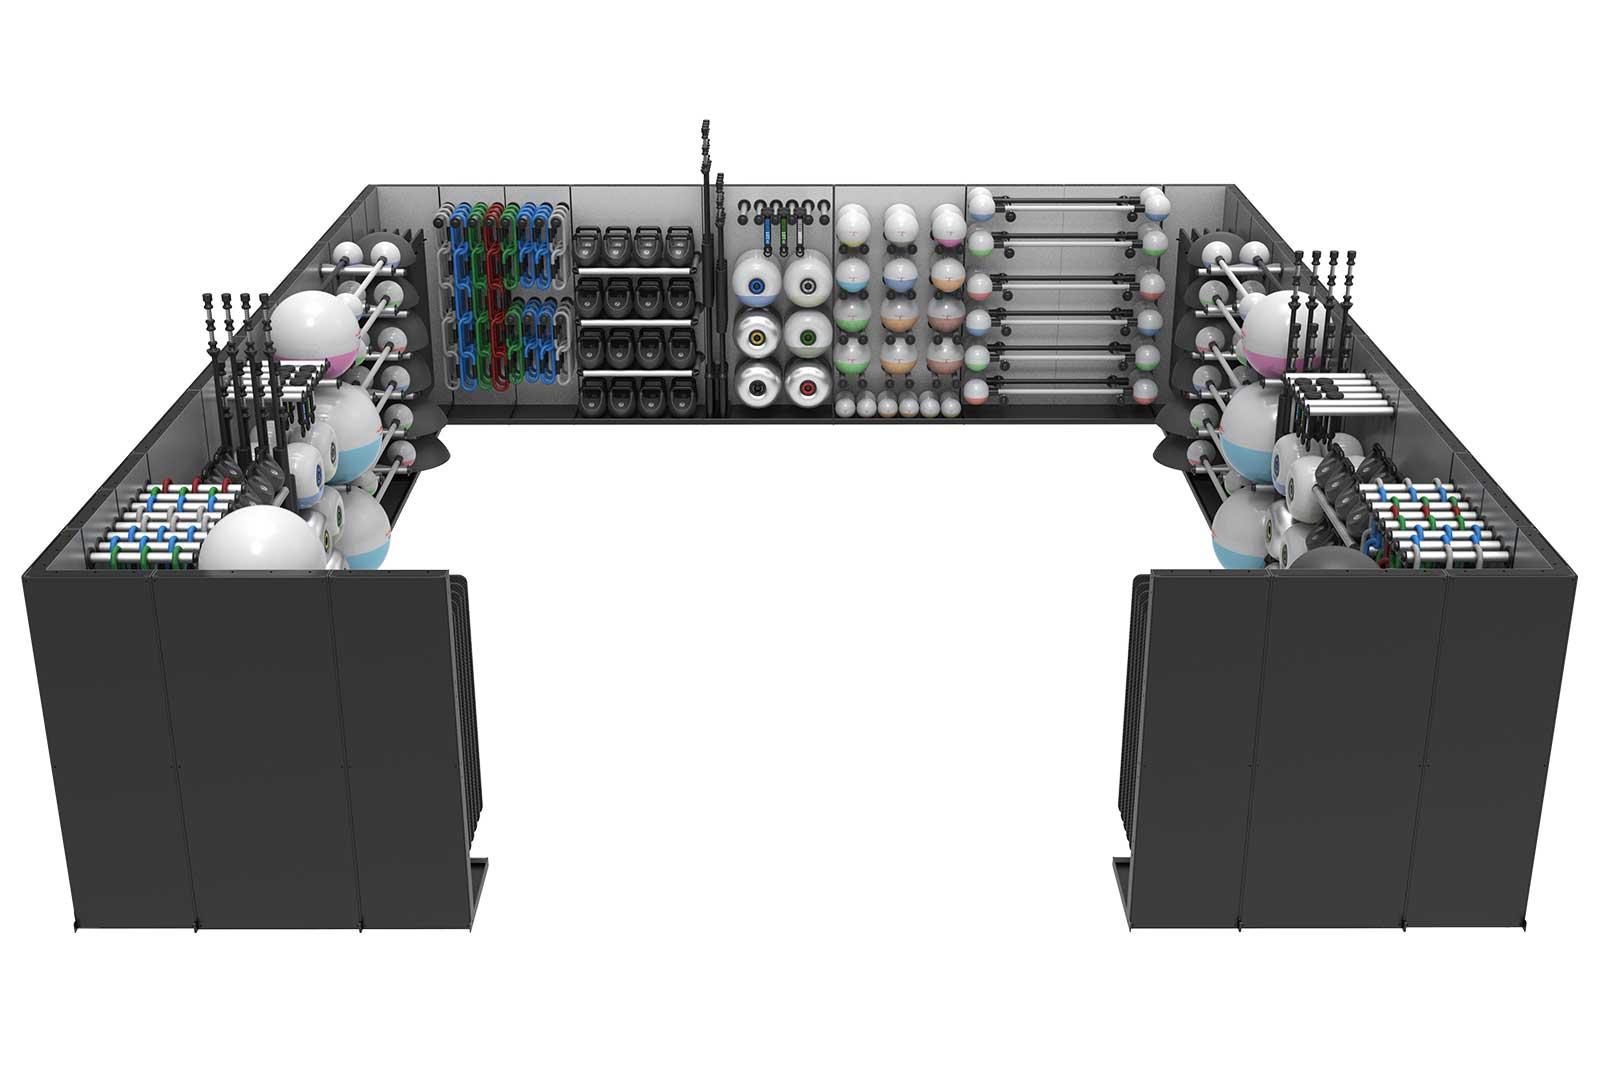 Reax Storage Room Confiuration